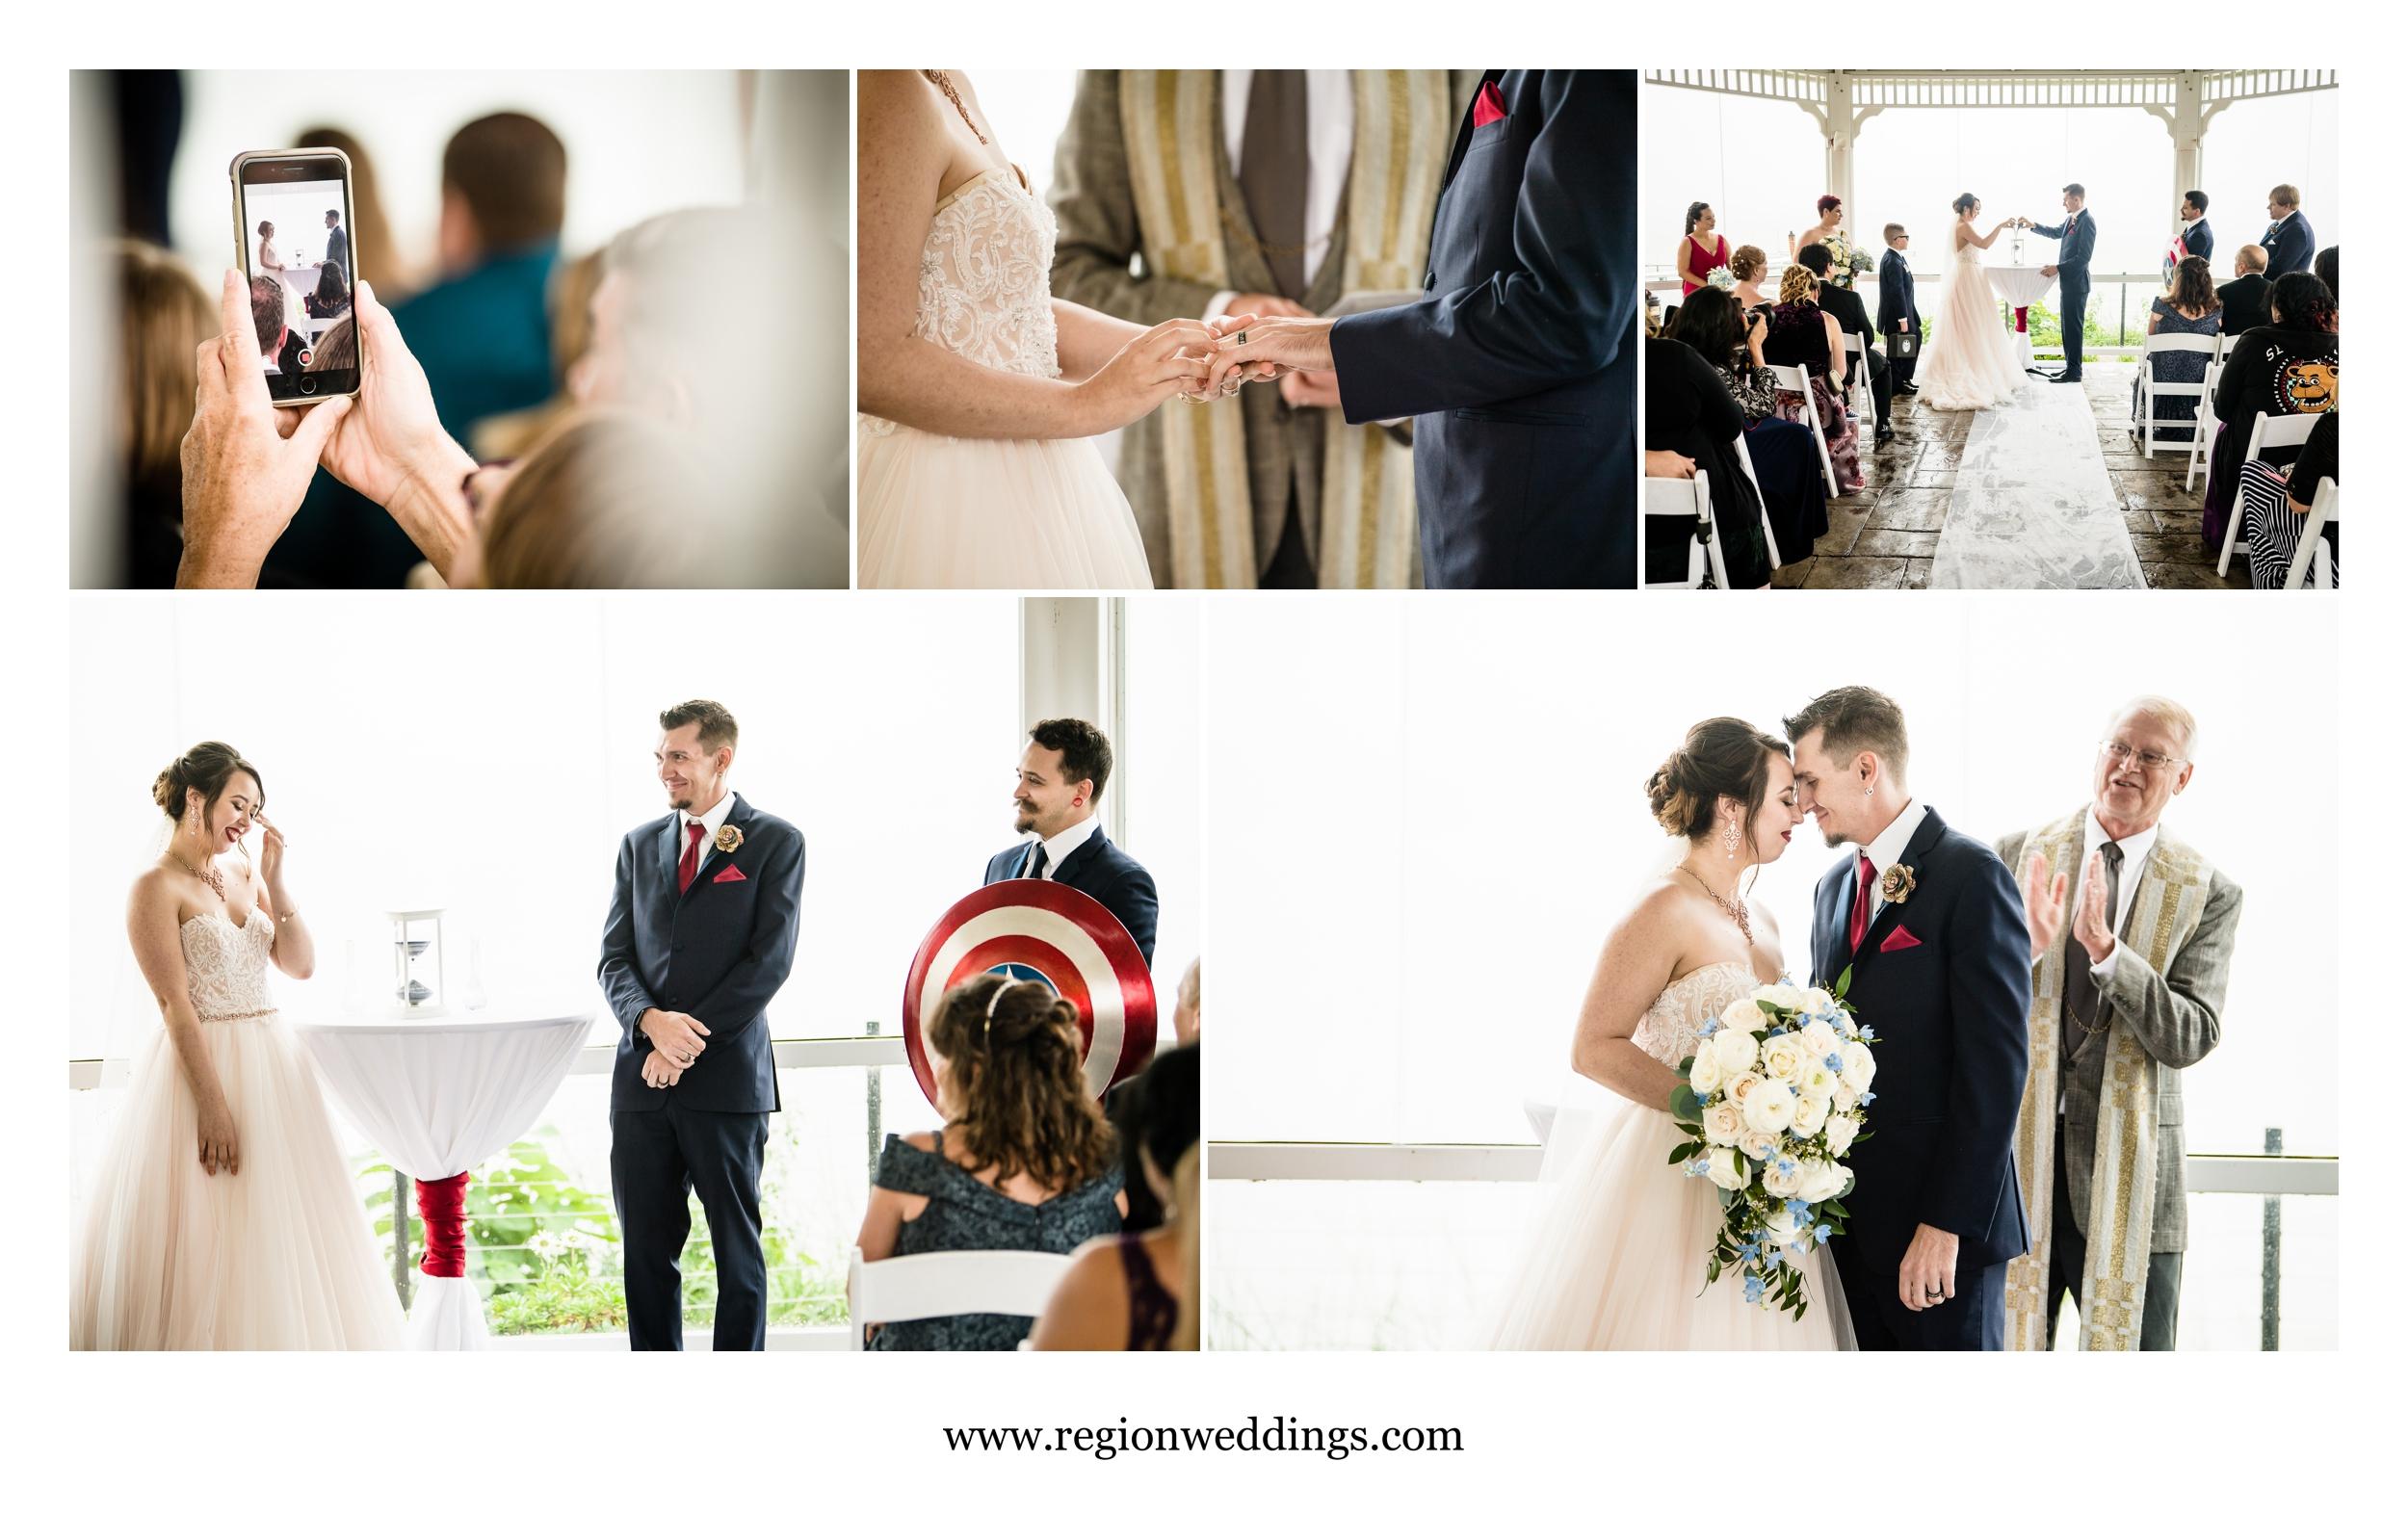 Wedding ceremony inside the Lighthouse gazebo in Cedar Lake.